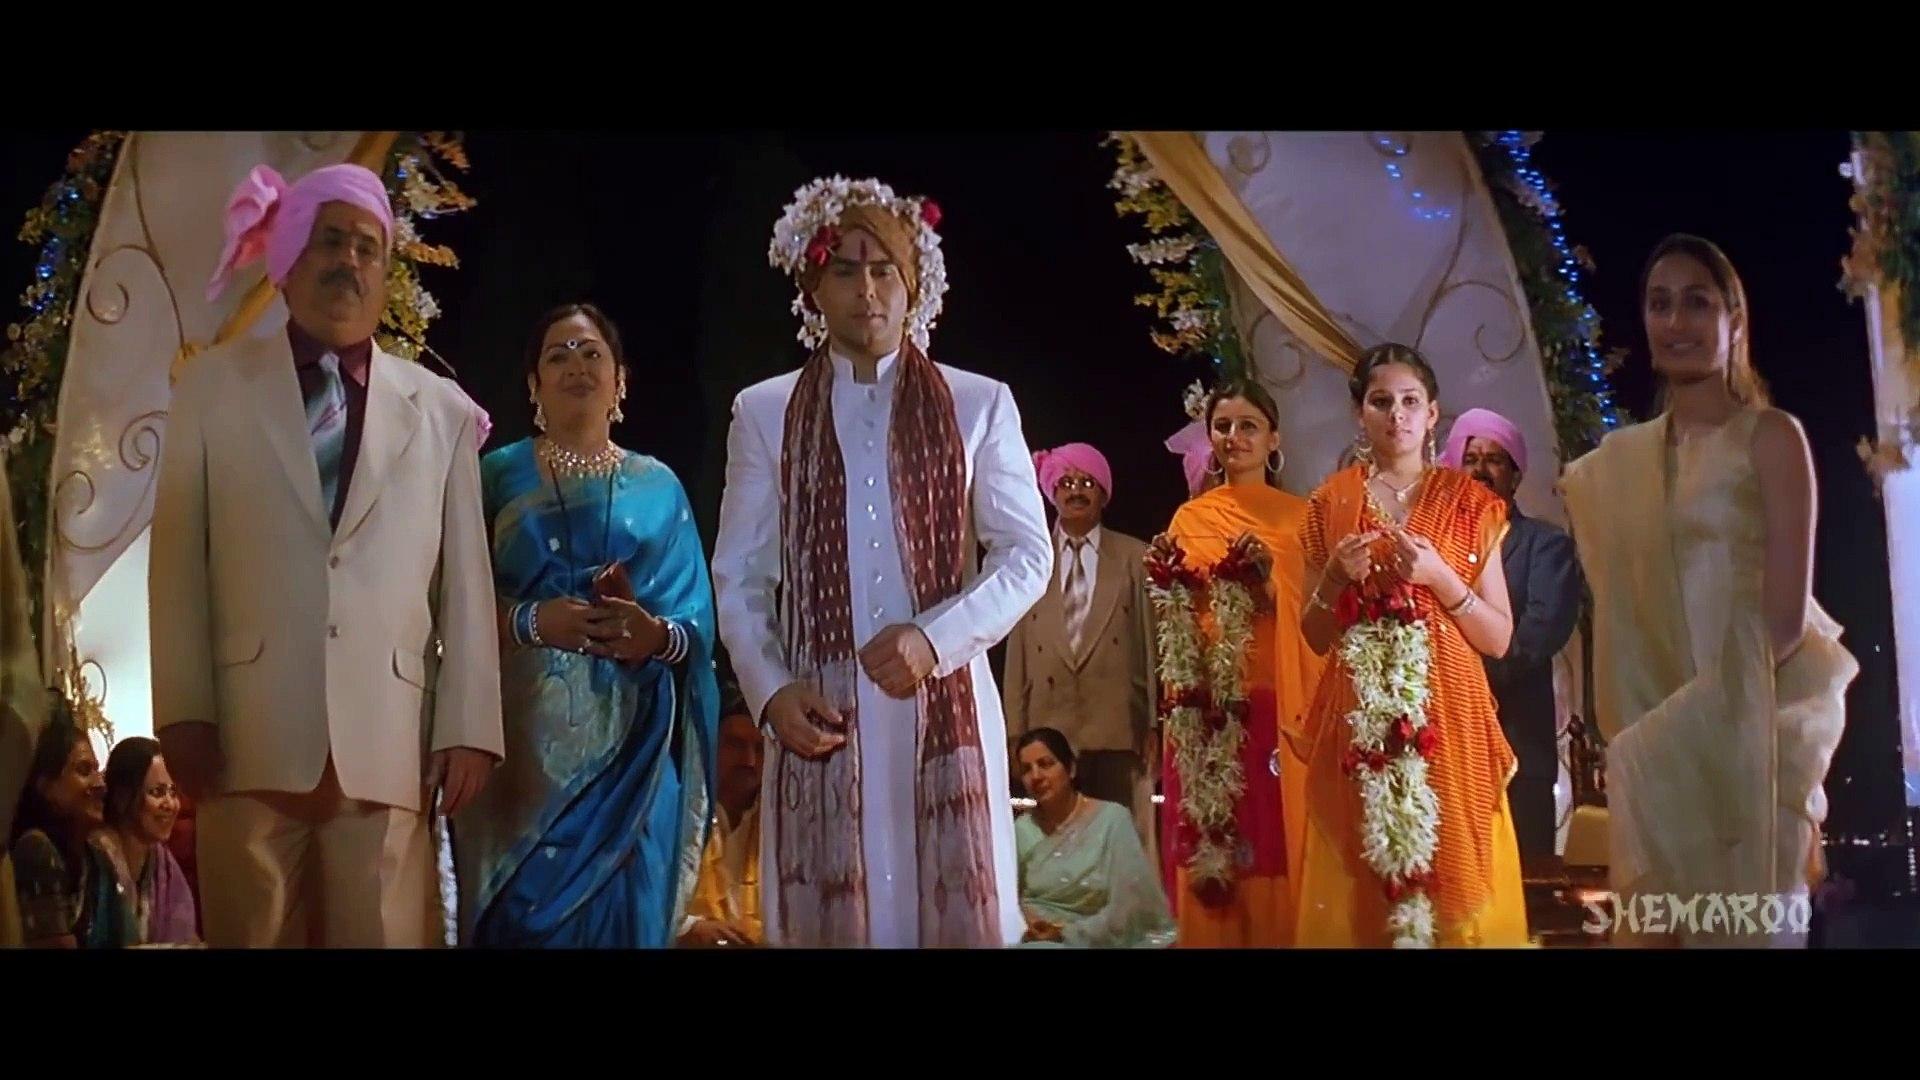 Ishq Na Ishq Ho Kisi ¦ Dosti-Friends Forever¦ Akshay Kumar ¦ Kareena Kapoor ¦ Bobby Deol ¦Gold songs